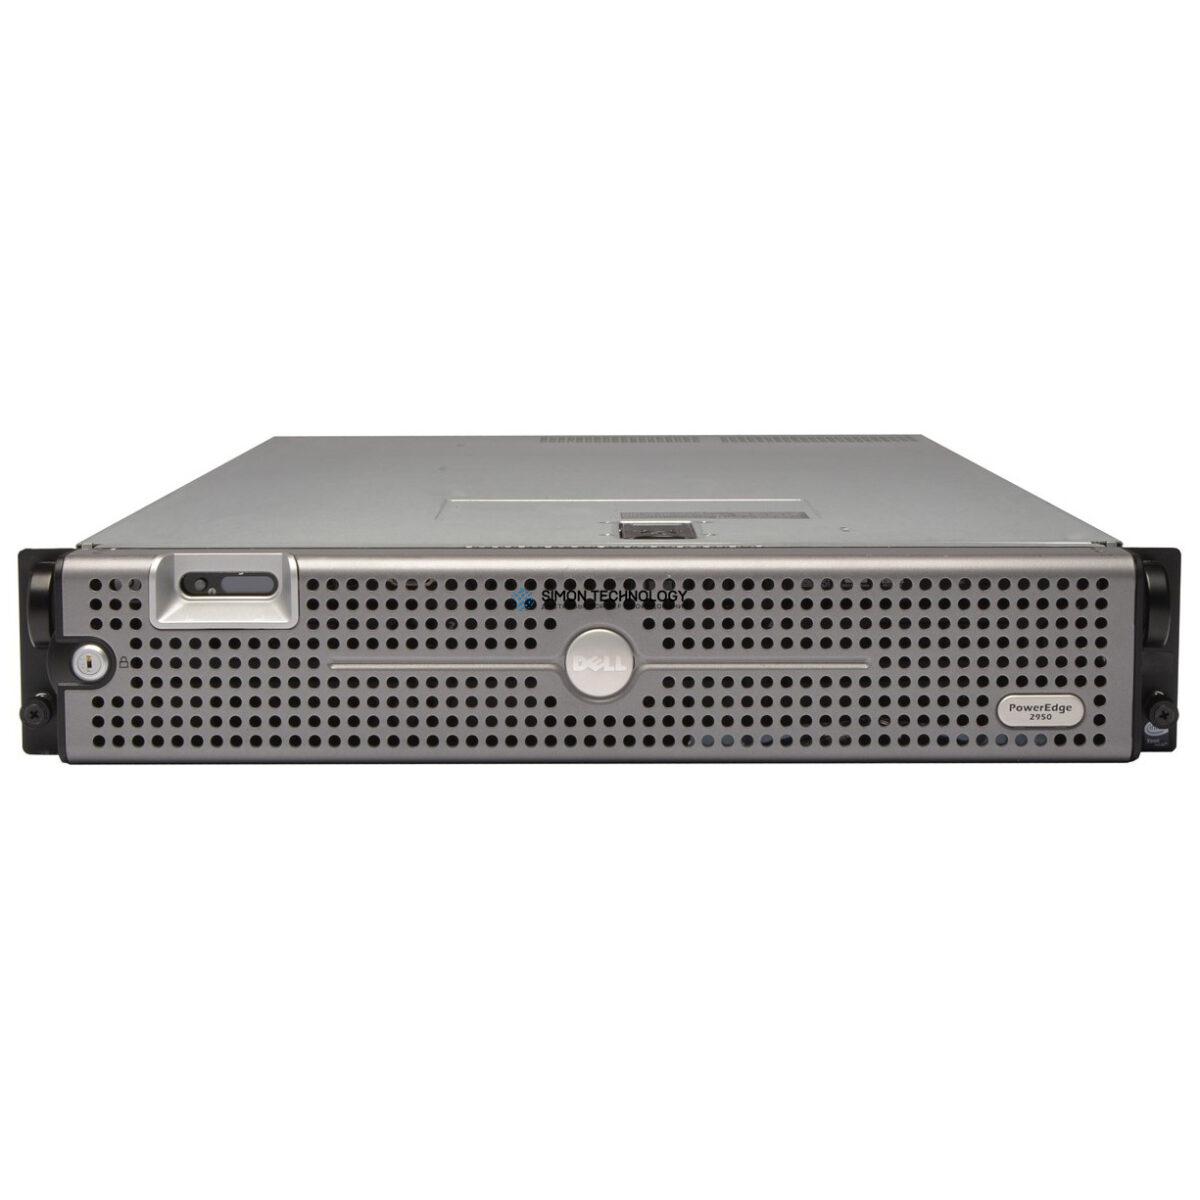 Сервер Dell PE 2950 III 8X2.5 2XE5440 (PE2950III-1X8-E5440)